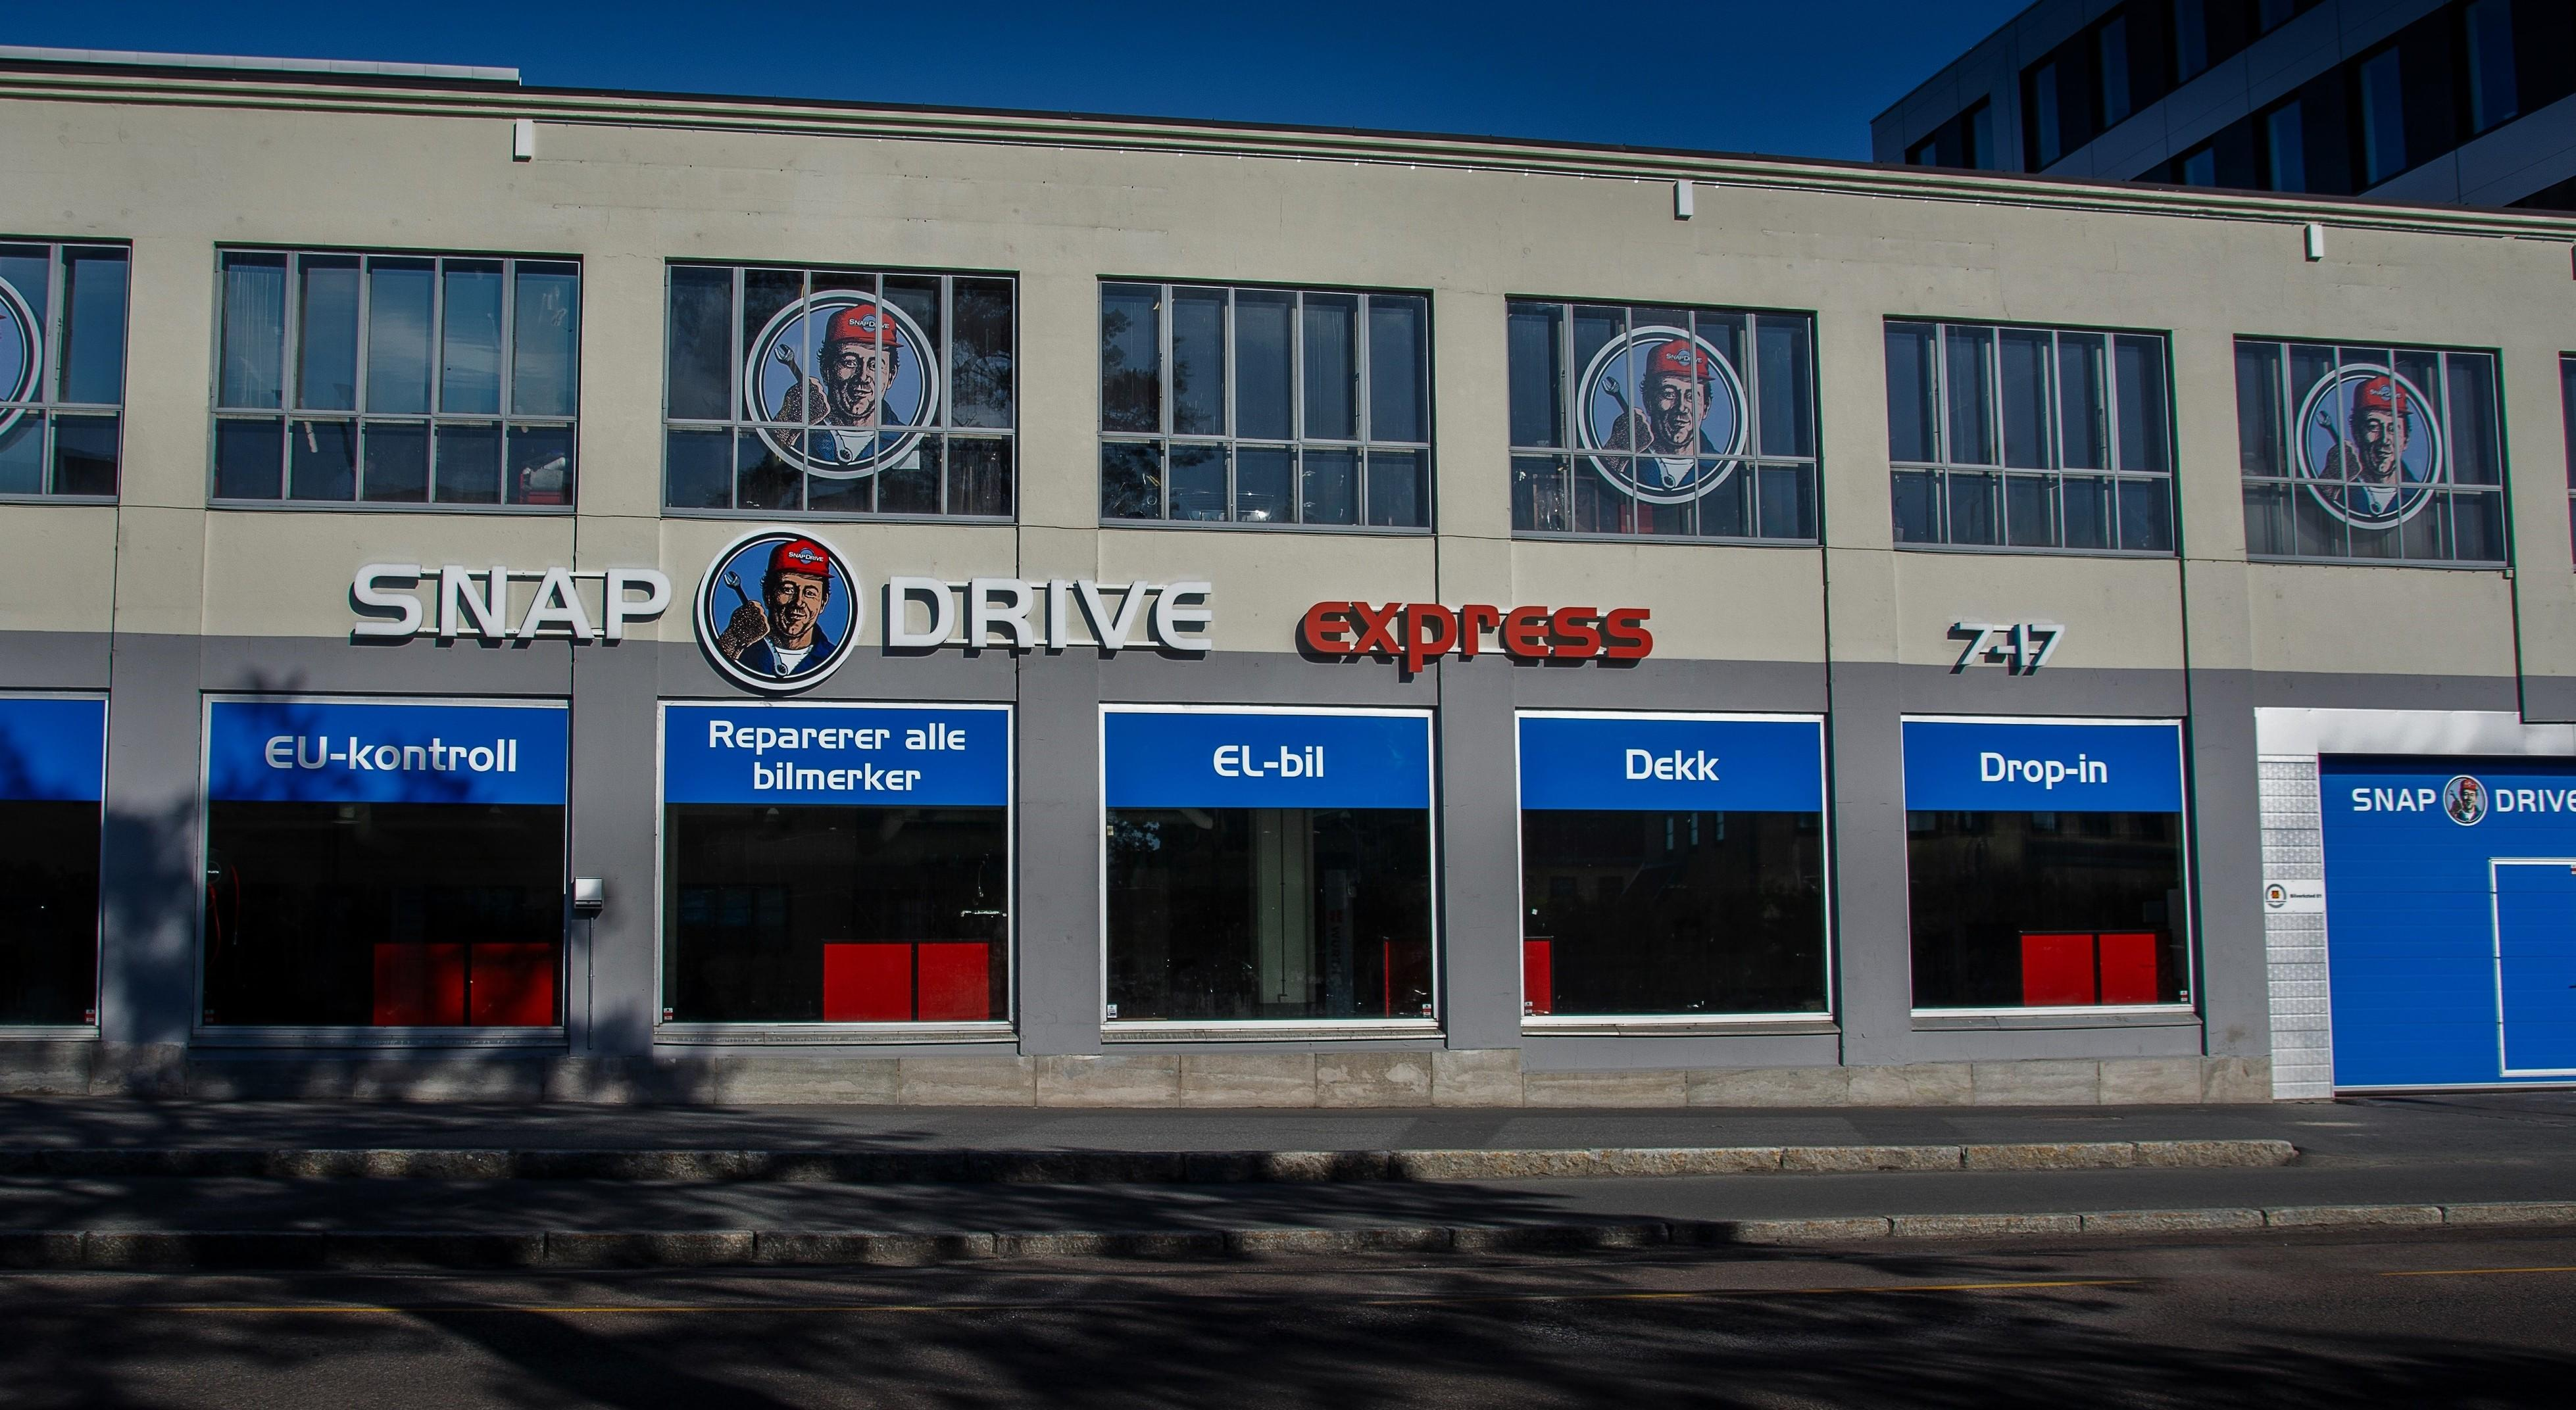 Snap Drive Helsfyr Express